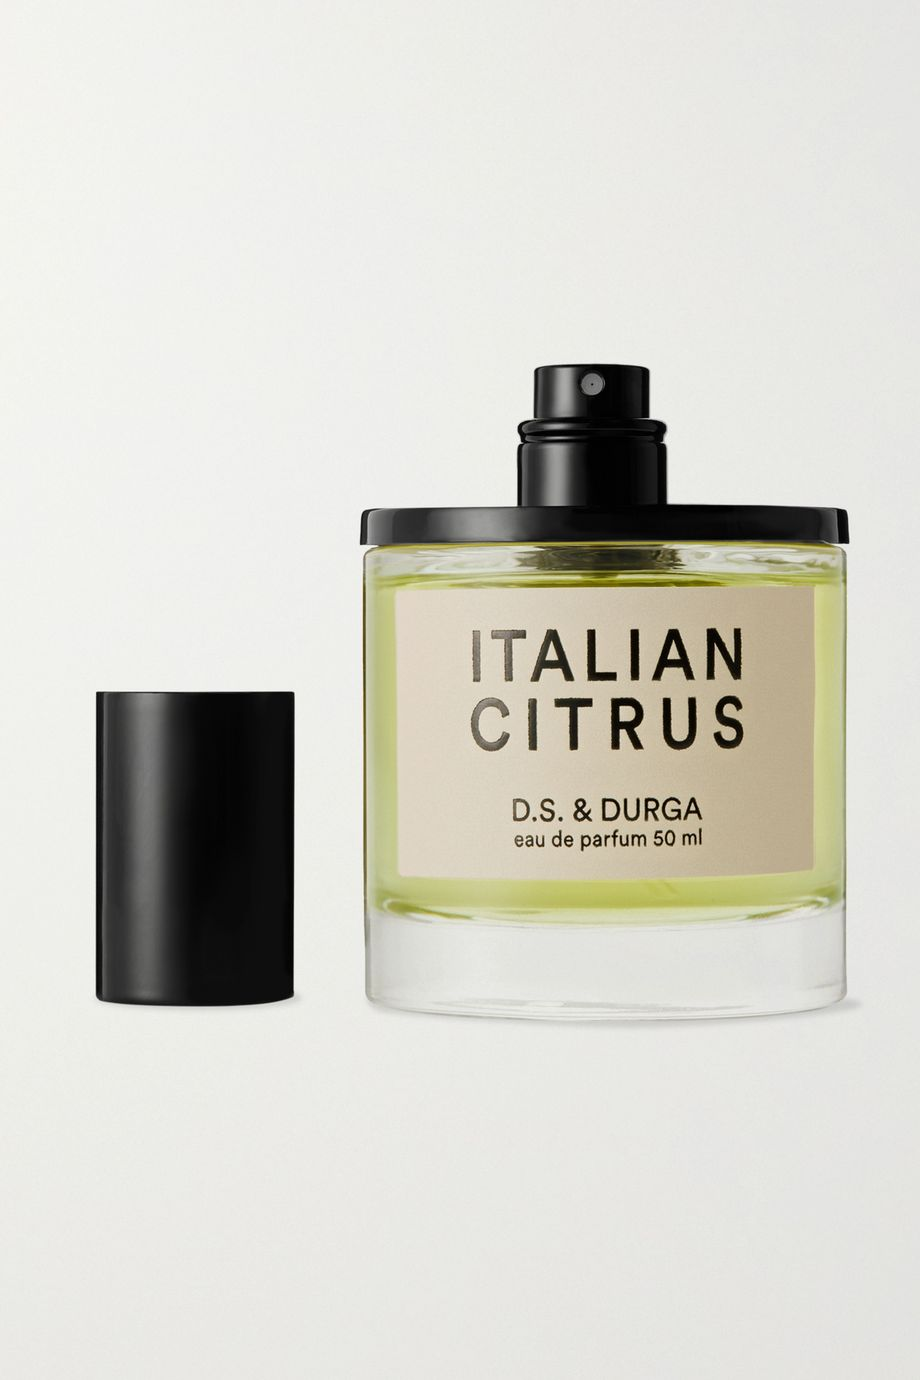 D.S. & Durga Eau de Parfum - Italian Citrus, 50ml